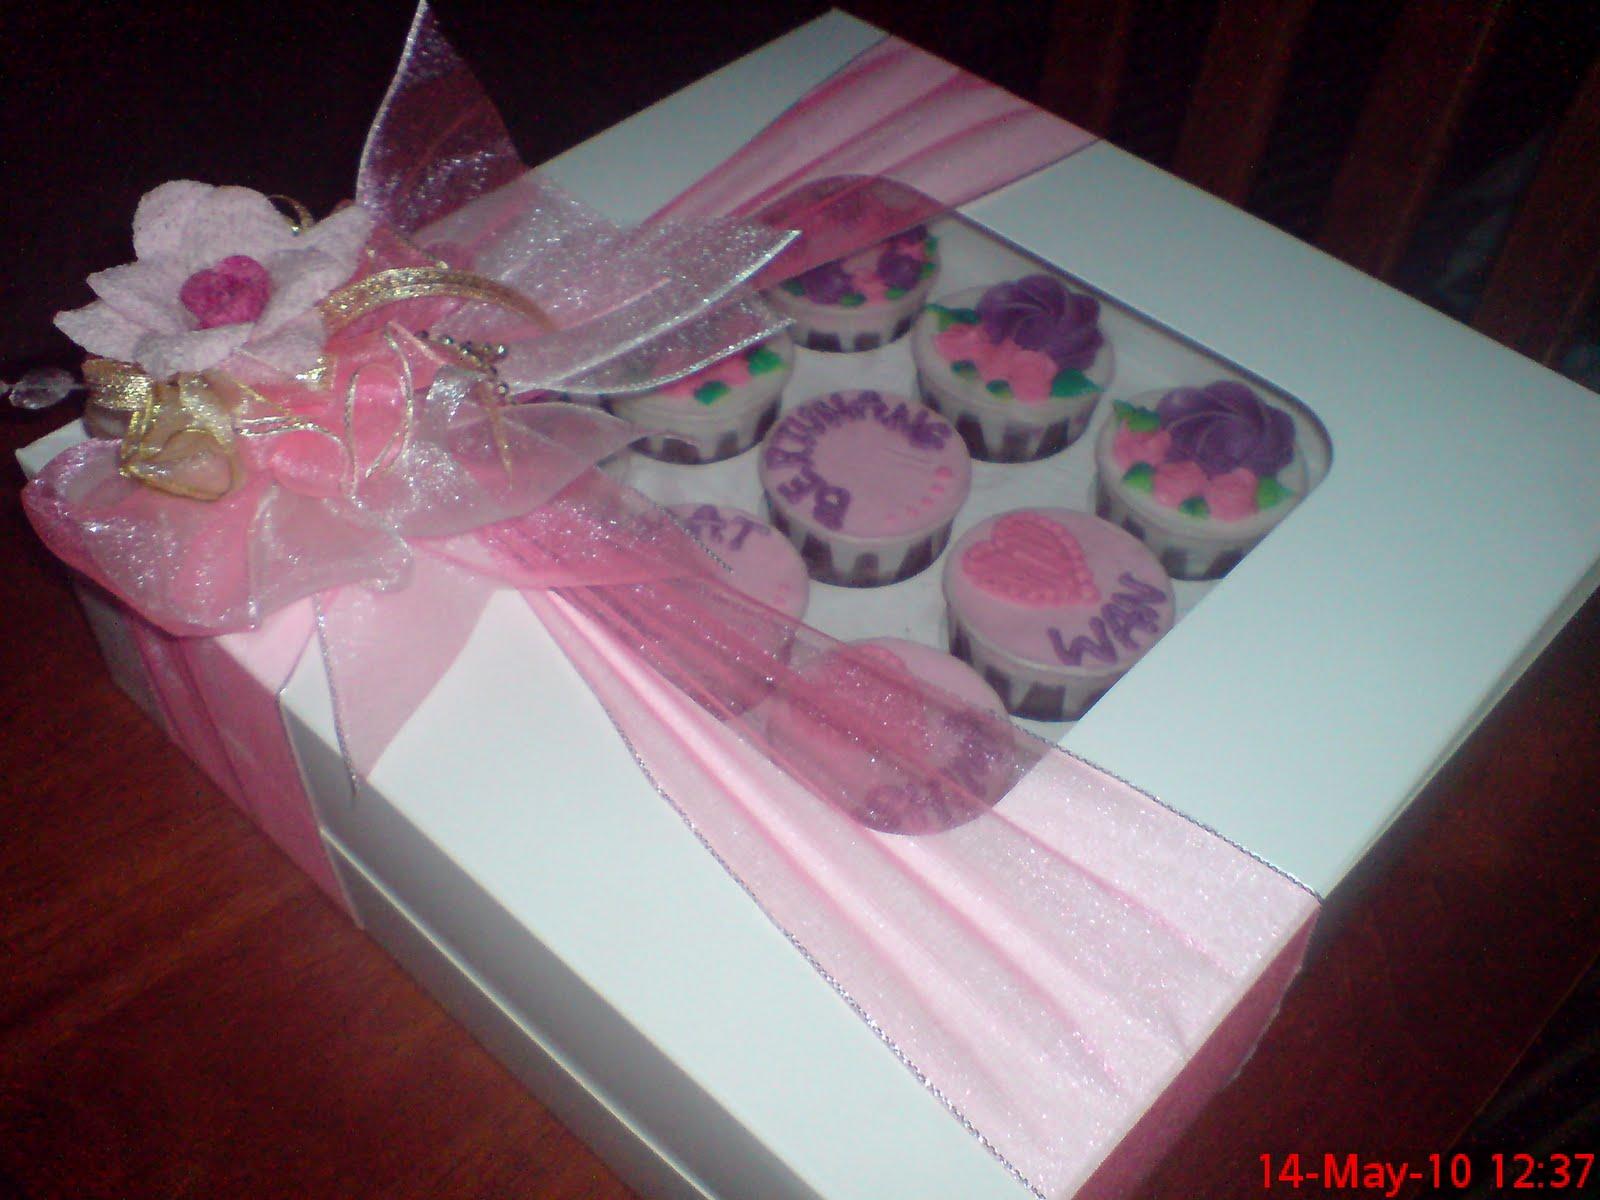 F2H DECORATIVE CAKES: Contoh Kotak Hantaran Cupcakes